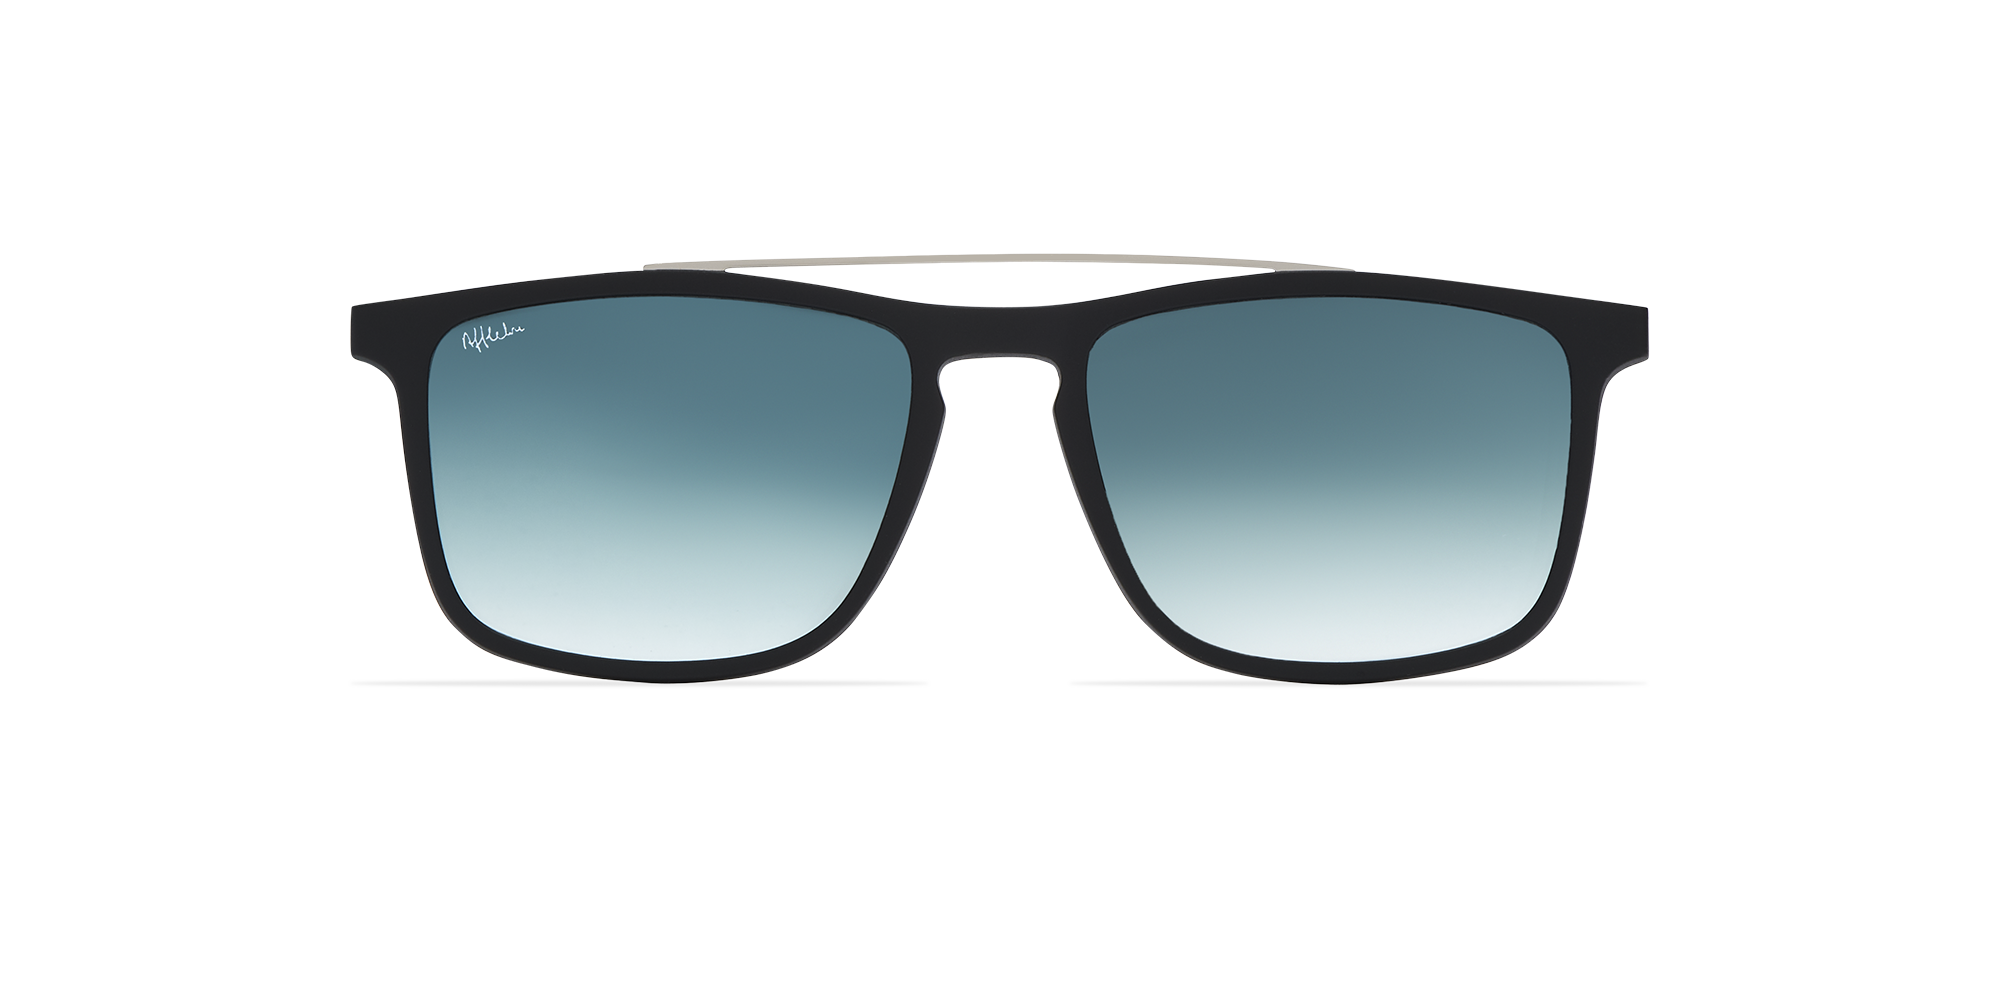 afflelou/france/products/smart_clip/clips_glasses/07630036428887_face.png